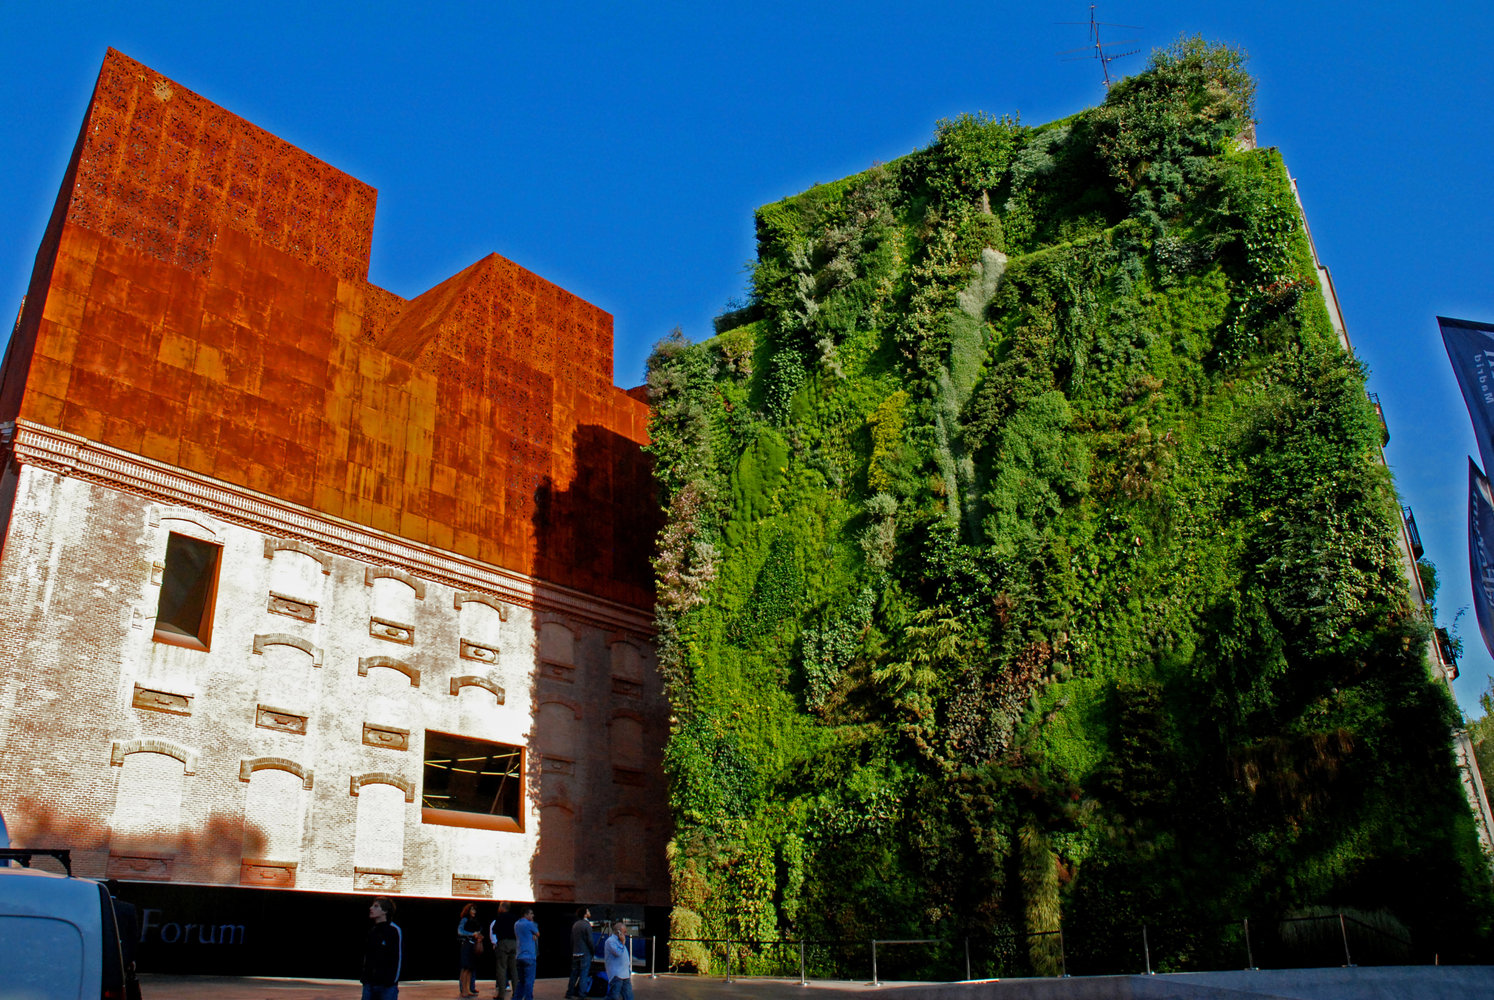 Caixa forum madrid mur vegetal patrick blanc for Jardin vertical caixaforum madrid